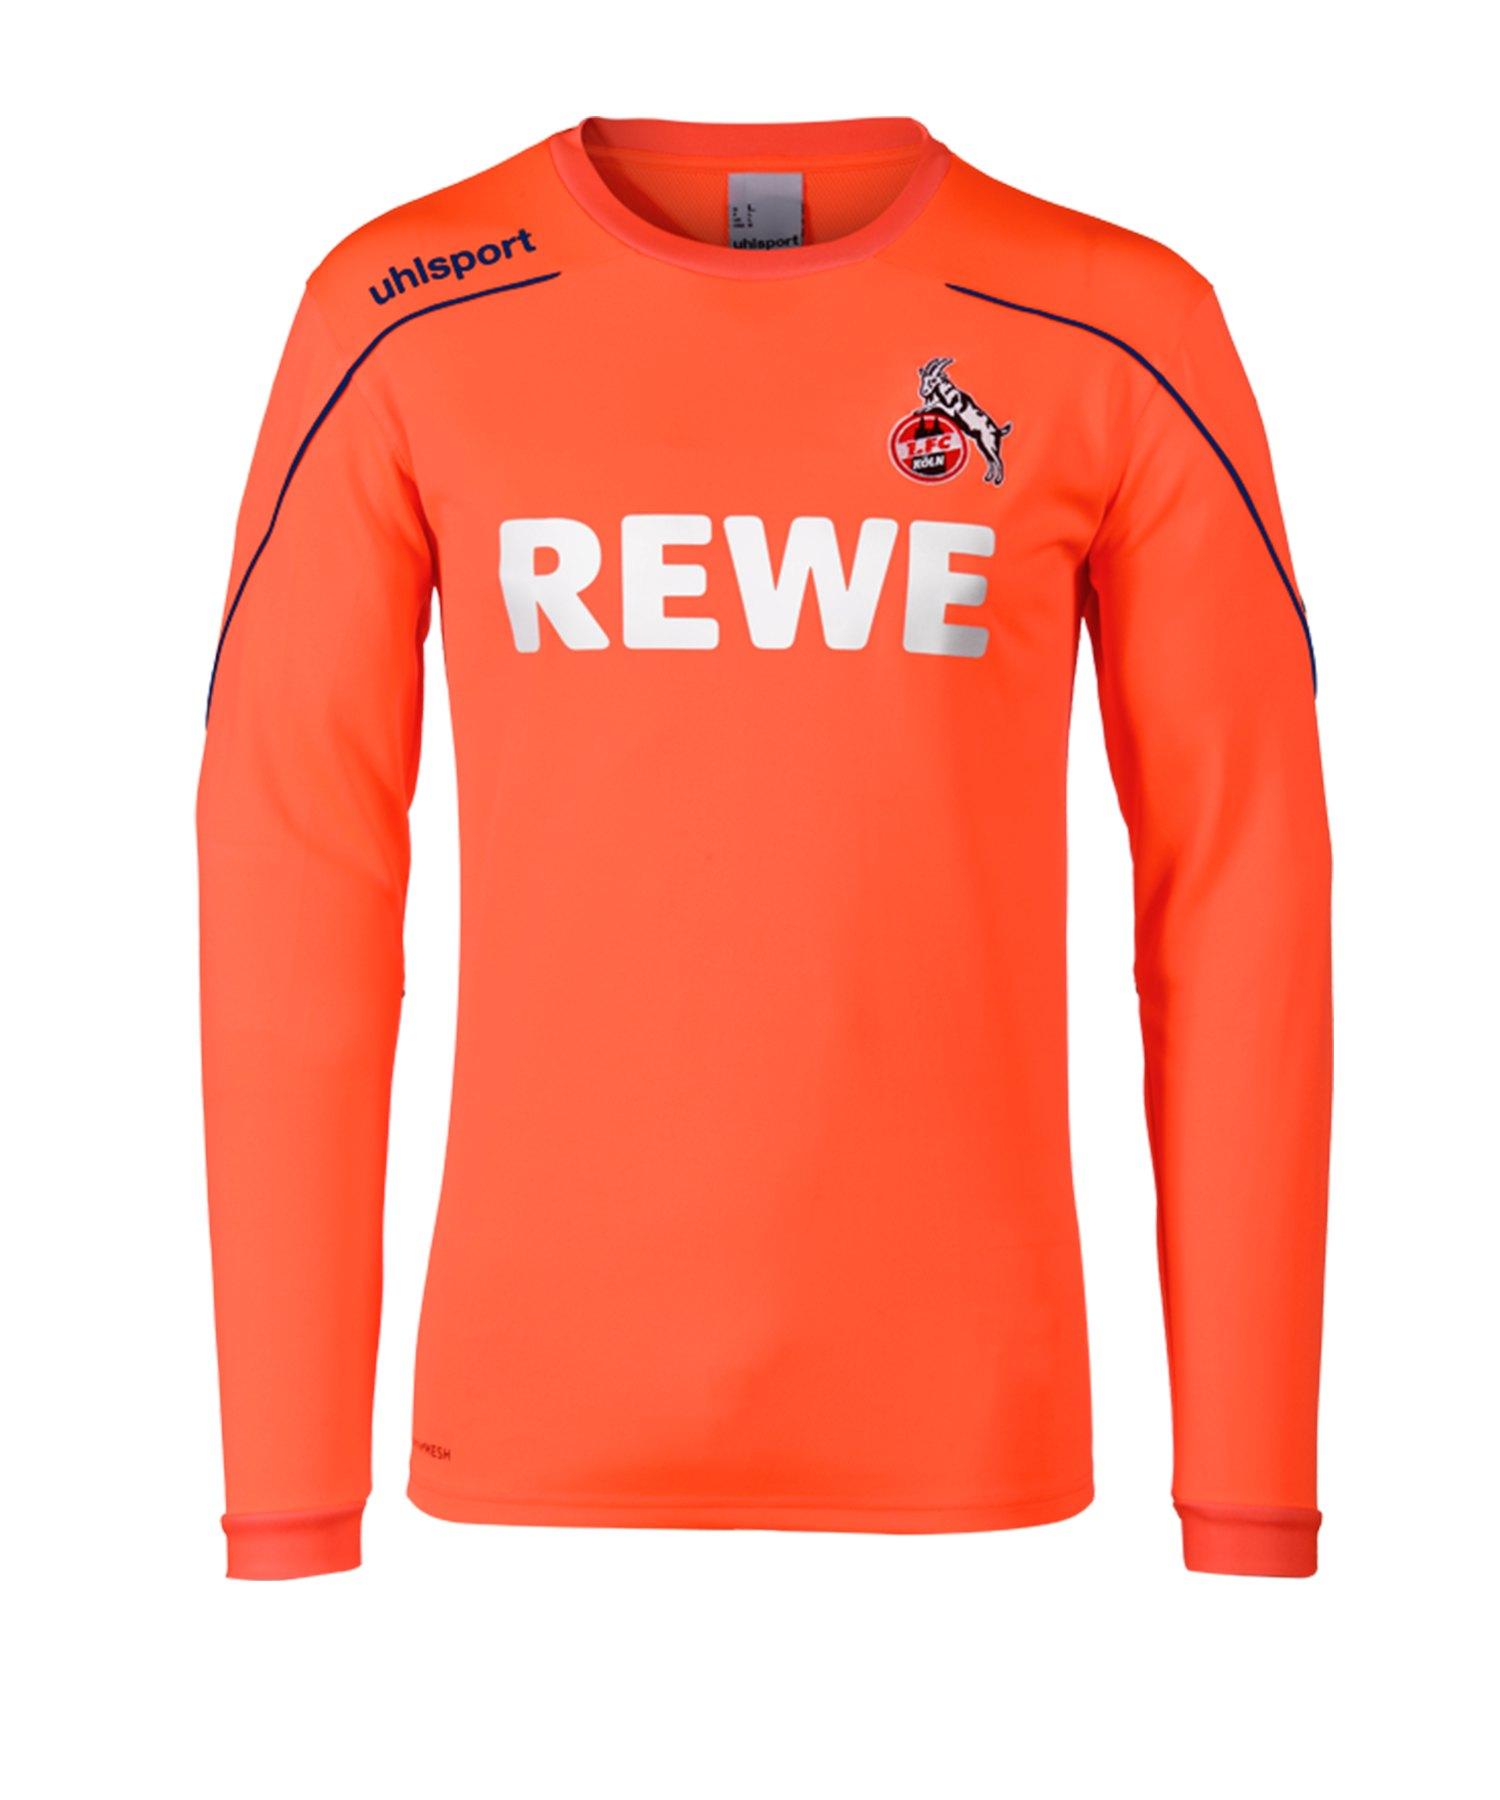 Uhlsport 1. FC Köln Torwarttrikot 2019/2020 Orange - orange